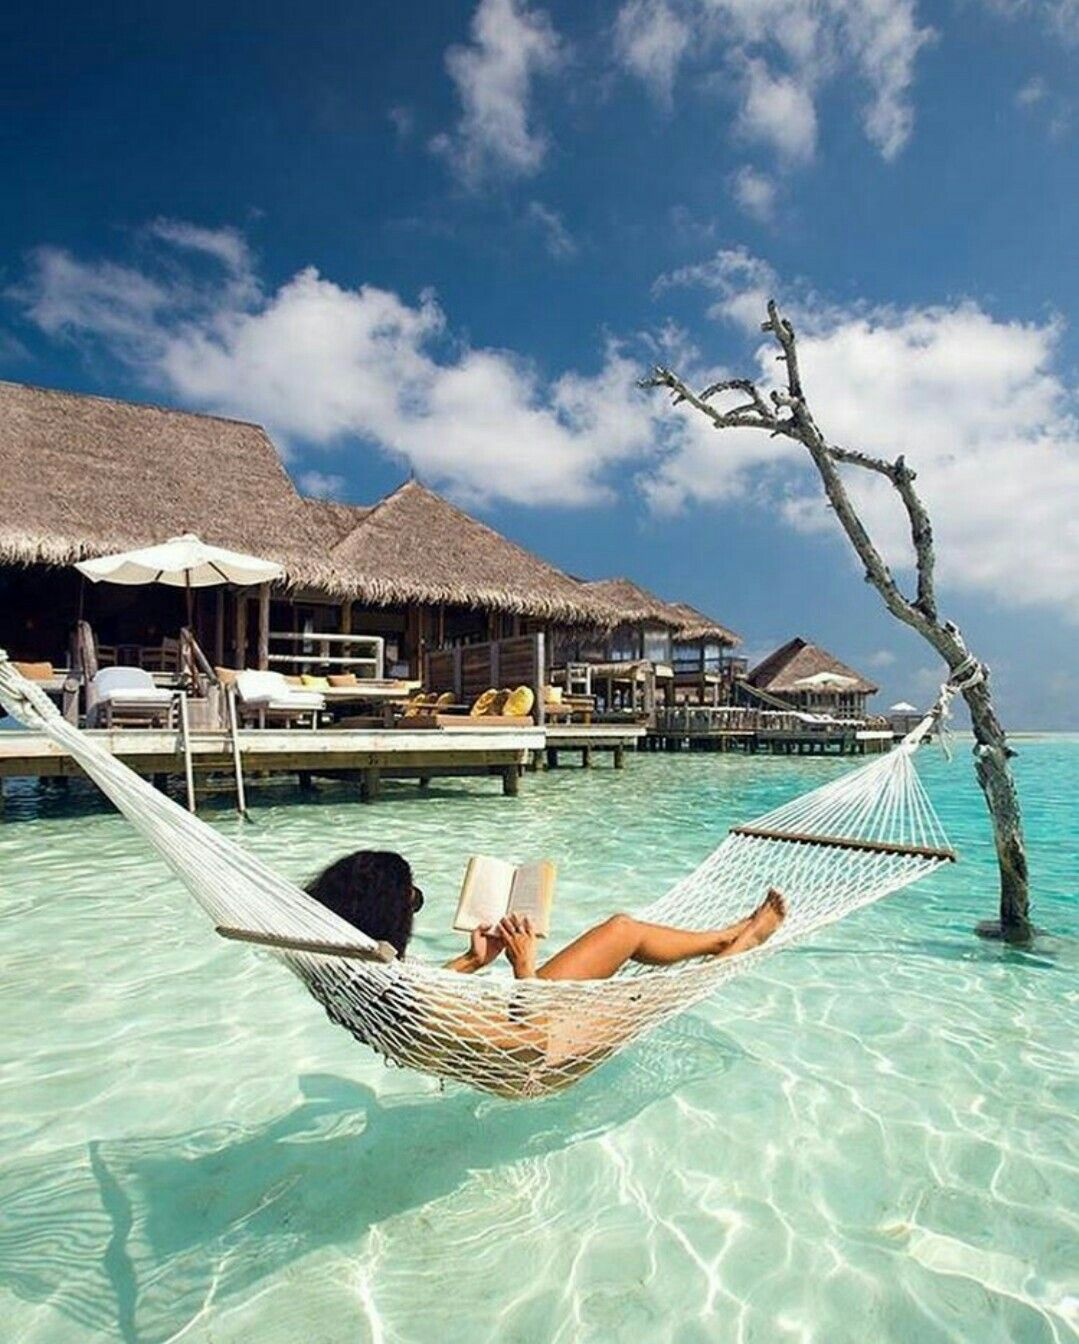 Tranquility destinations tranquilitydestinations on pinterest